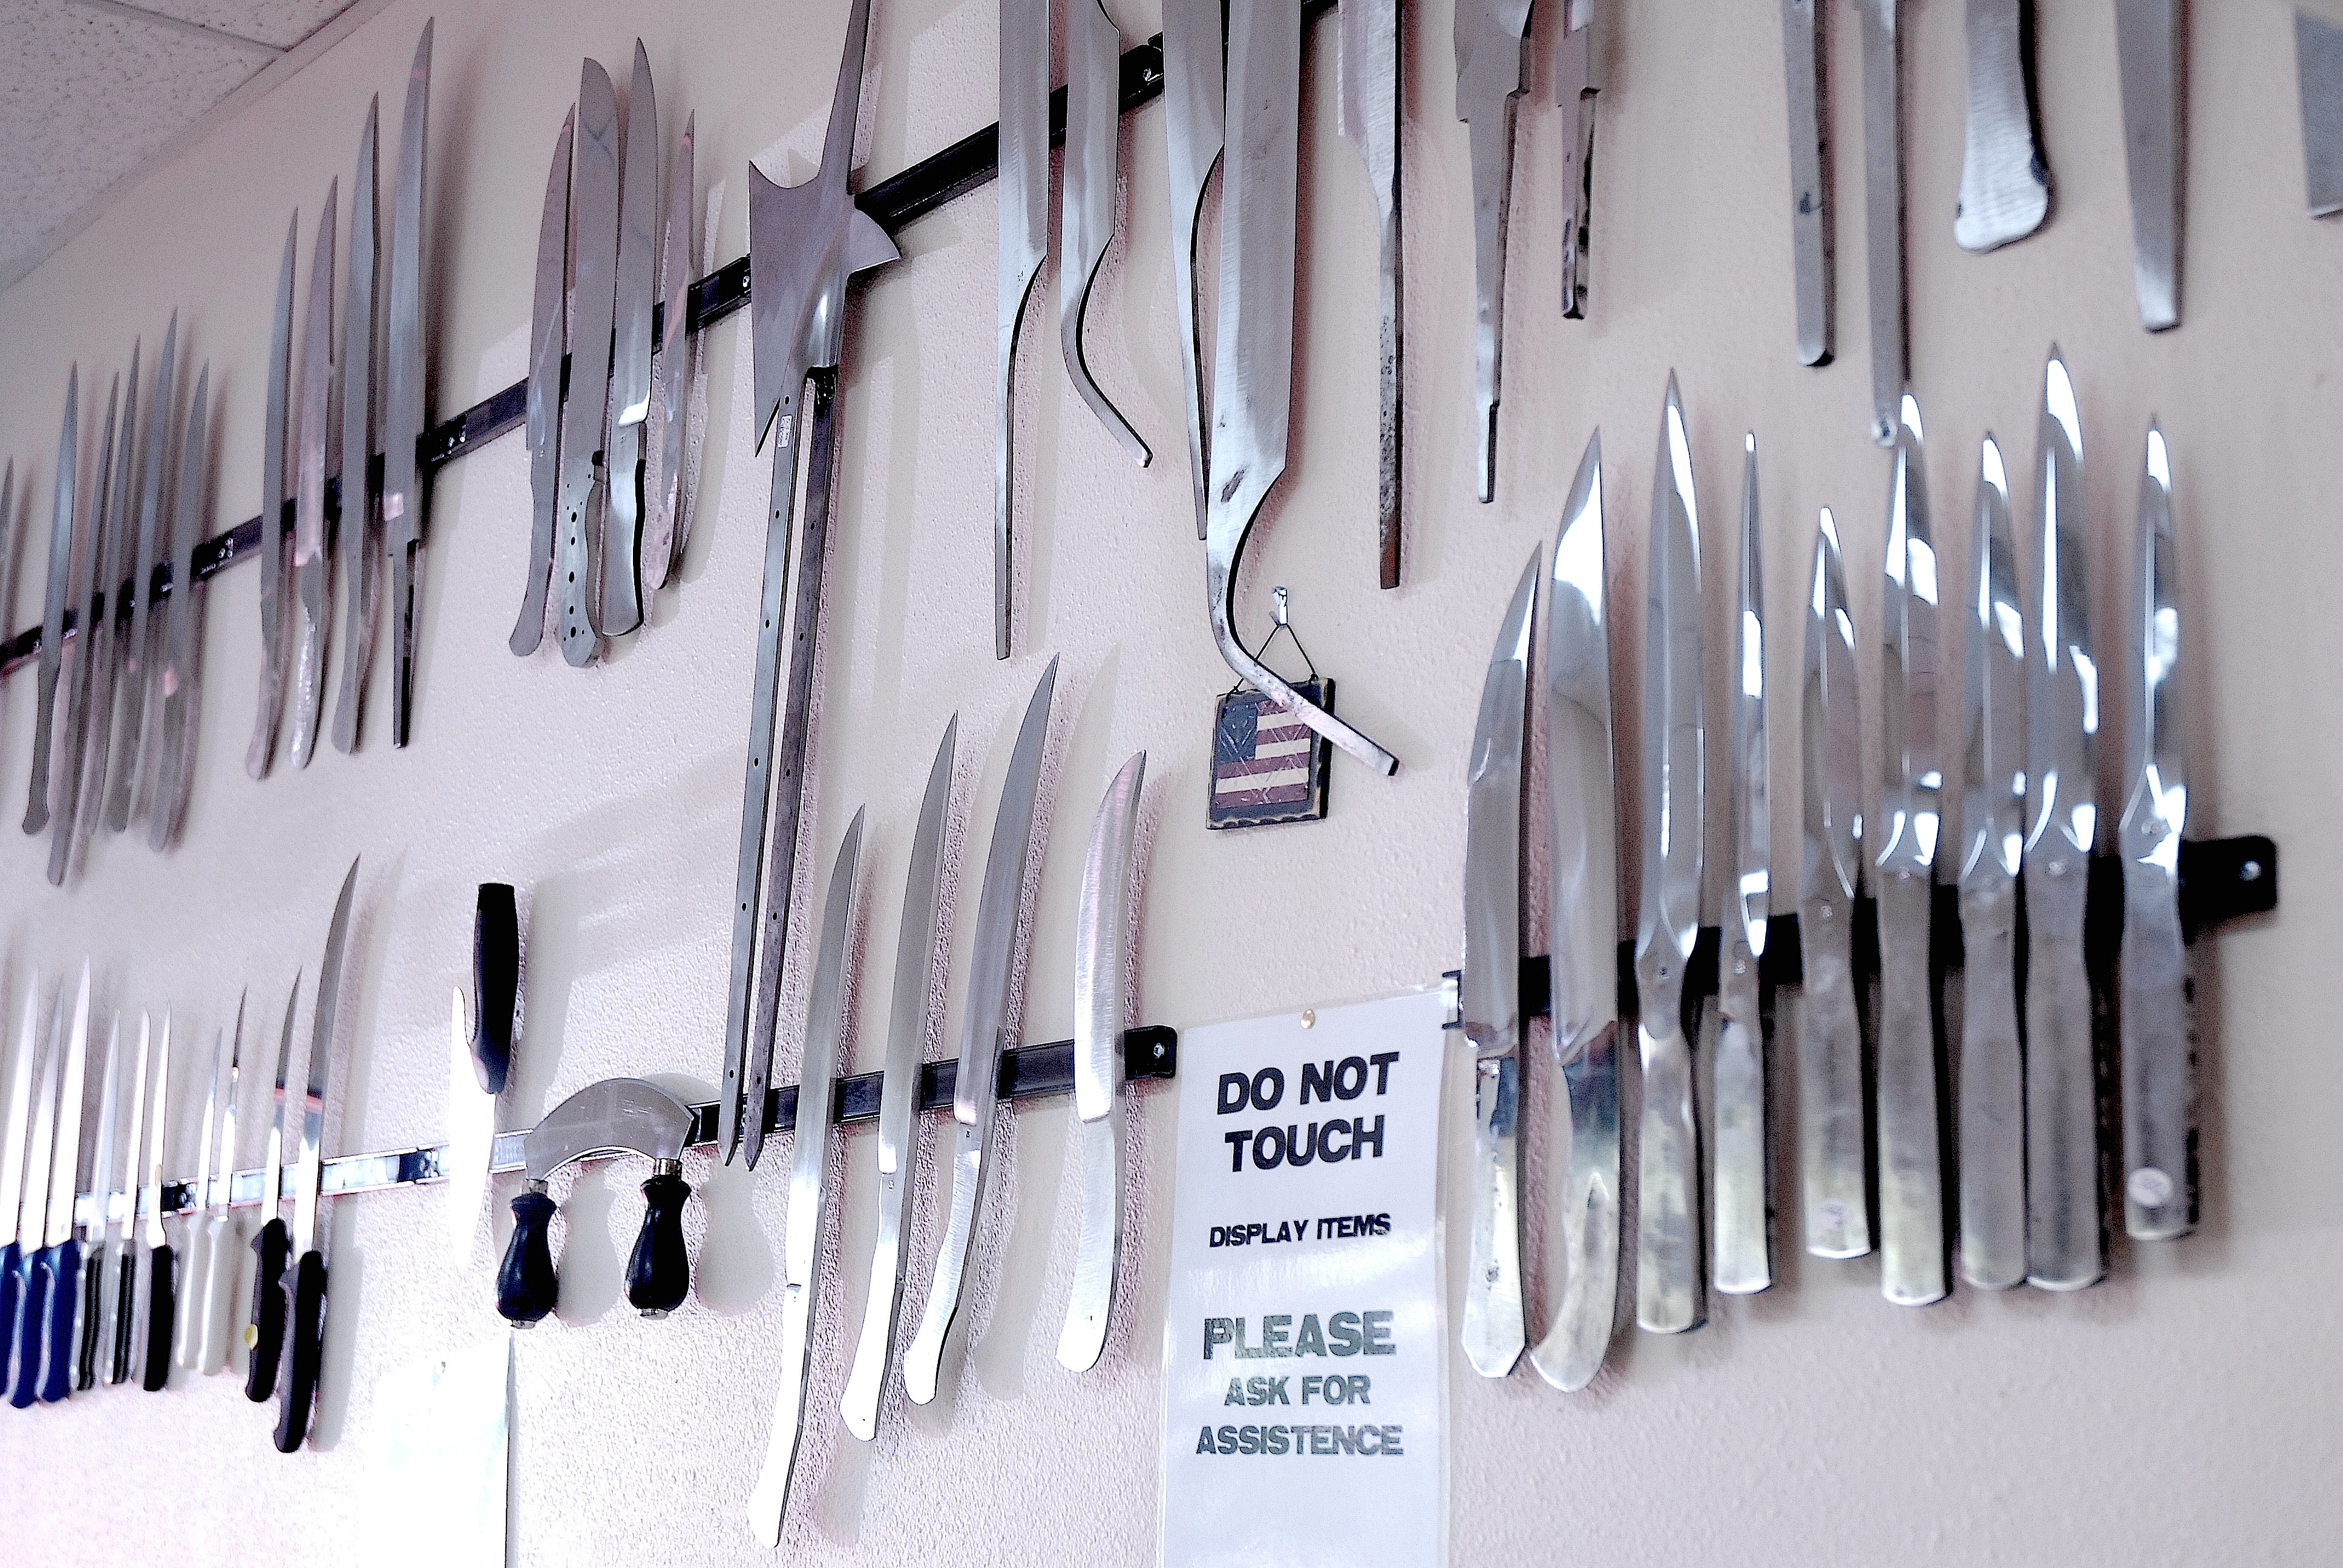 bladesmith's shop a sharp idea for ballard | westside seattle